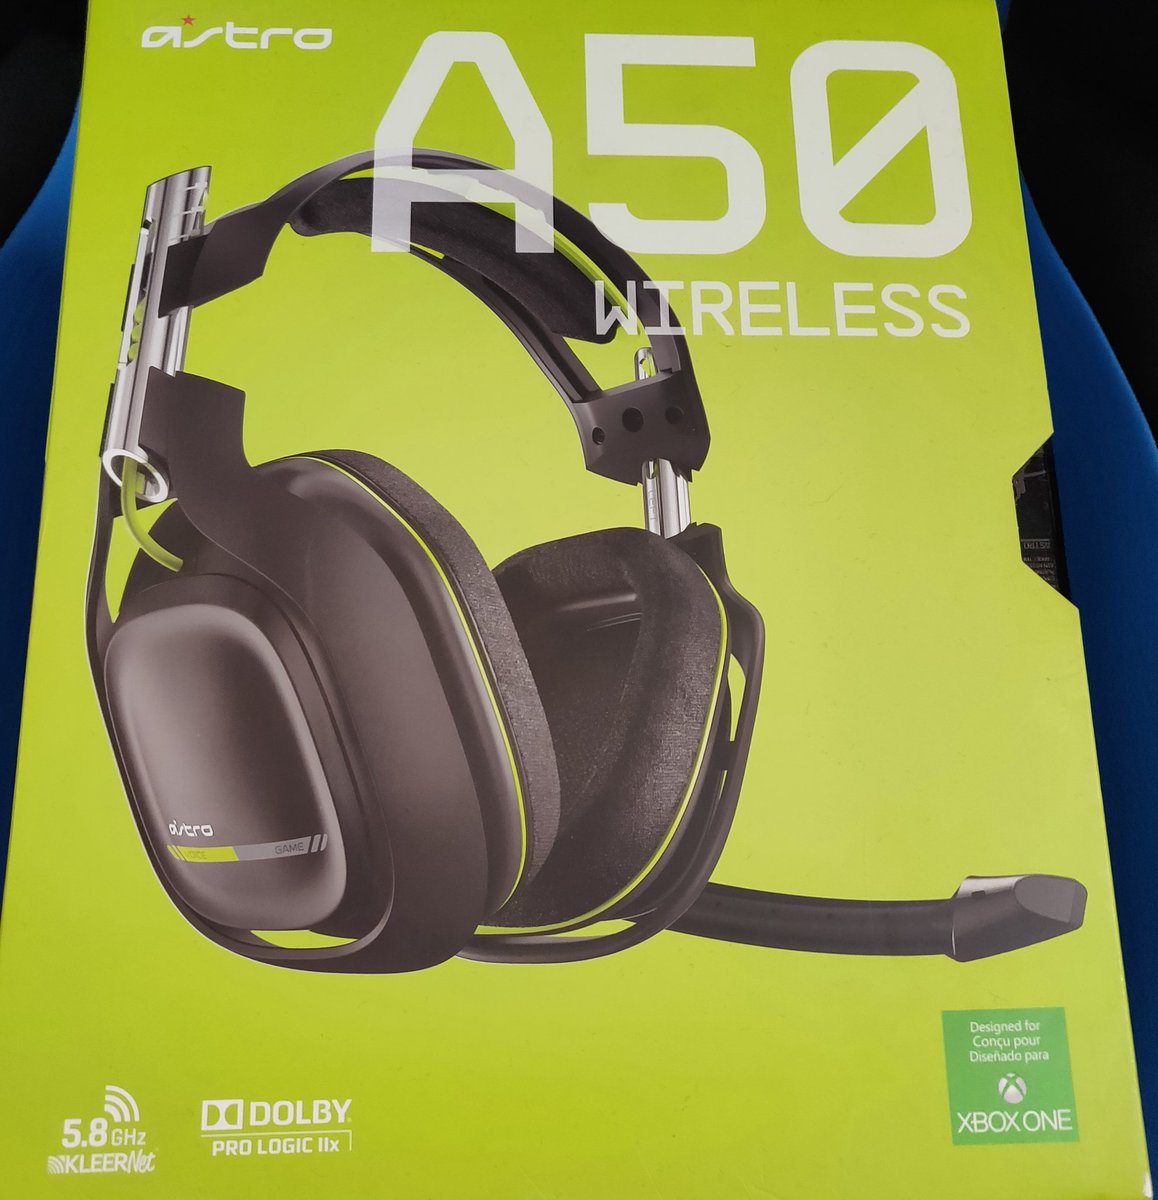 Retweet deze tweet om de Astro A50 headset te winnen! ???????????? twitch.tv/yaraskygaming